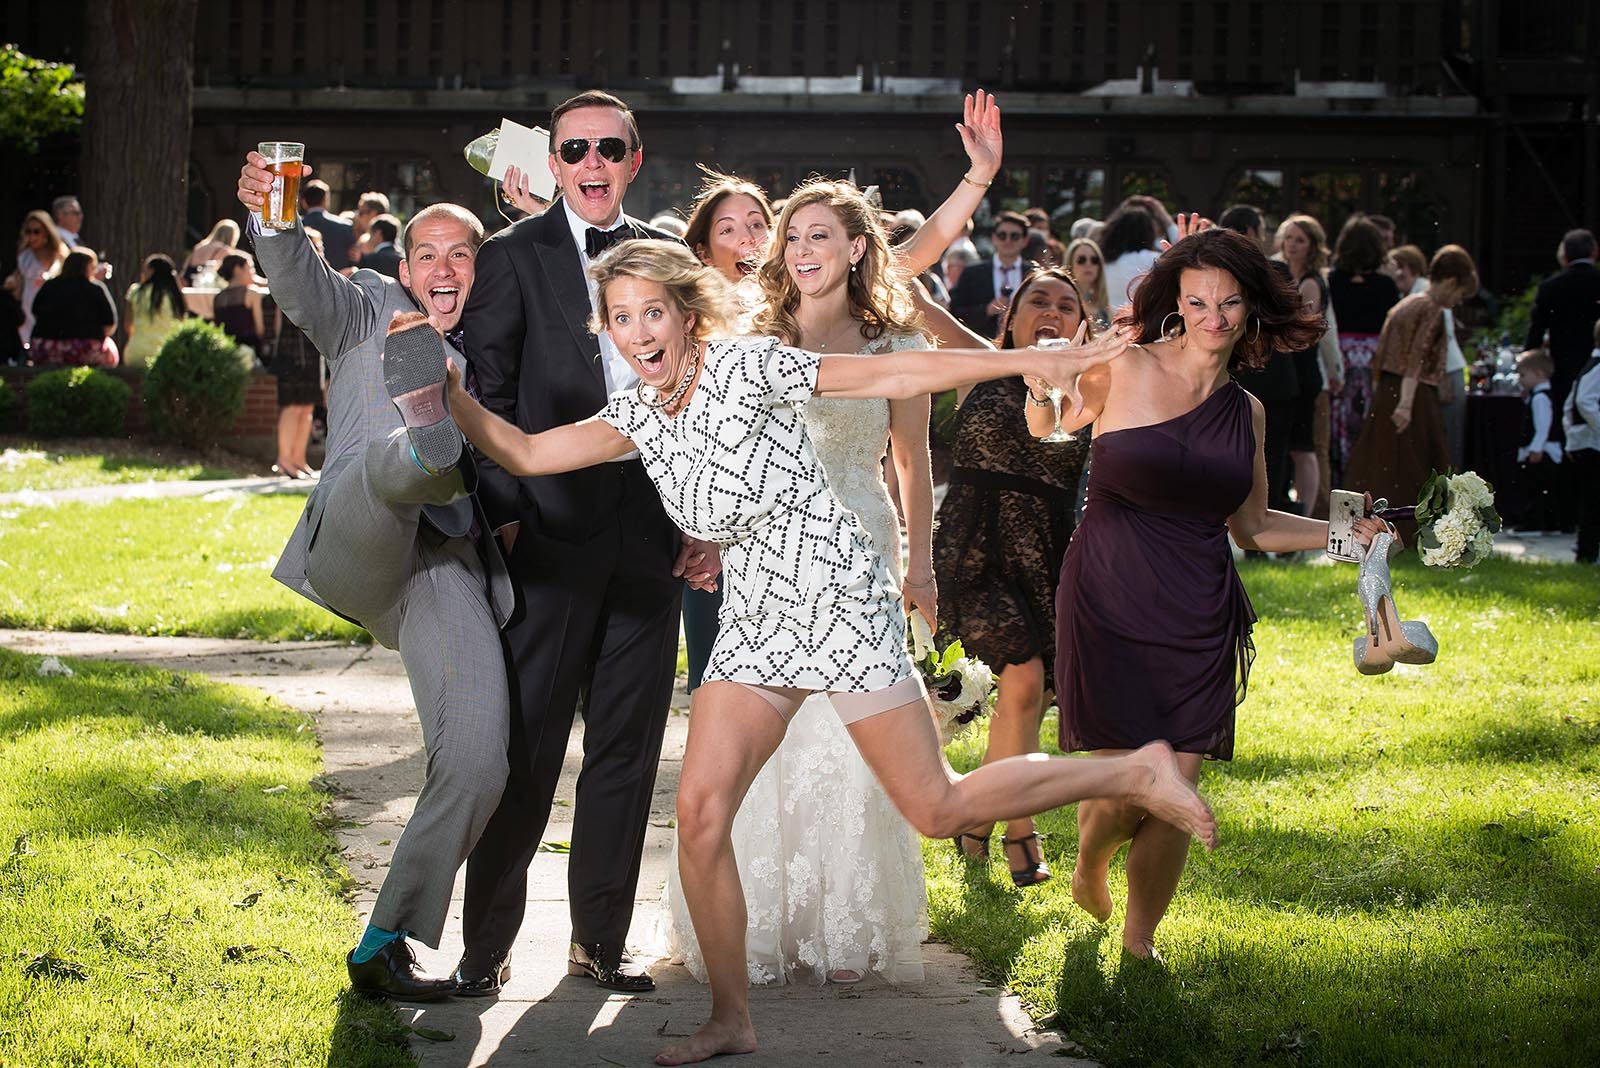 Bride Groom Wedding Photobomb